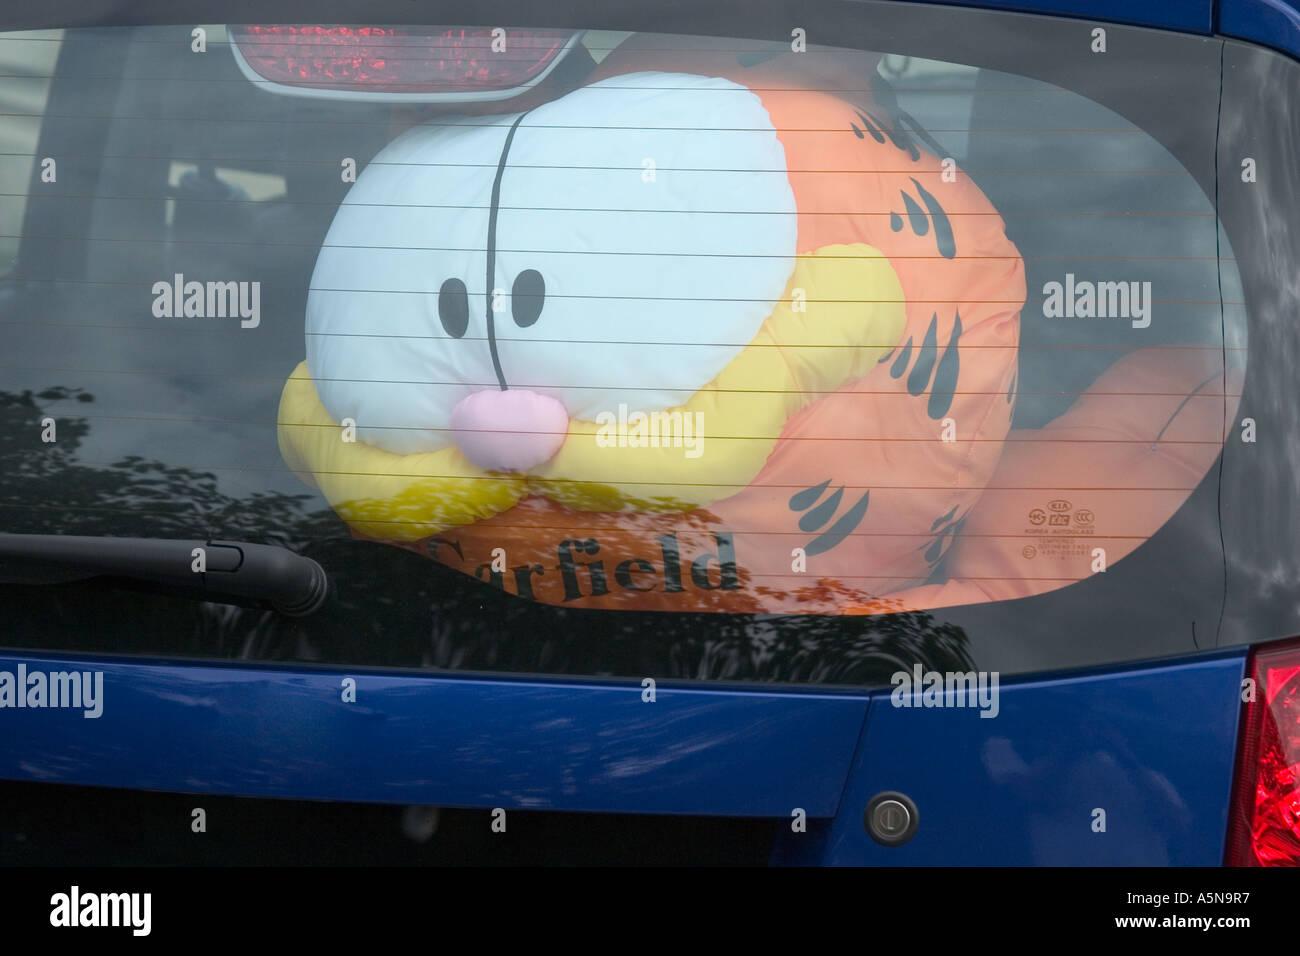 Garfield Doll Behind Car Window Stock Photo Alamy